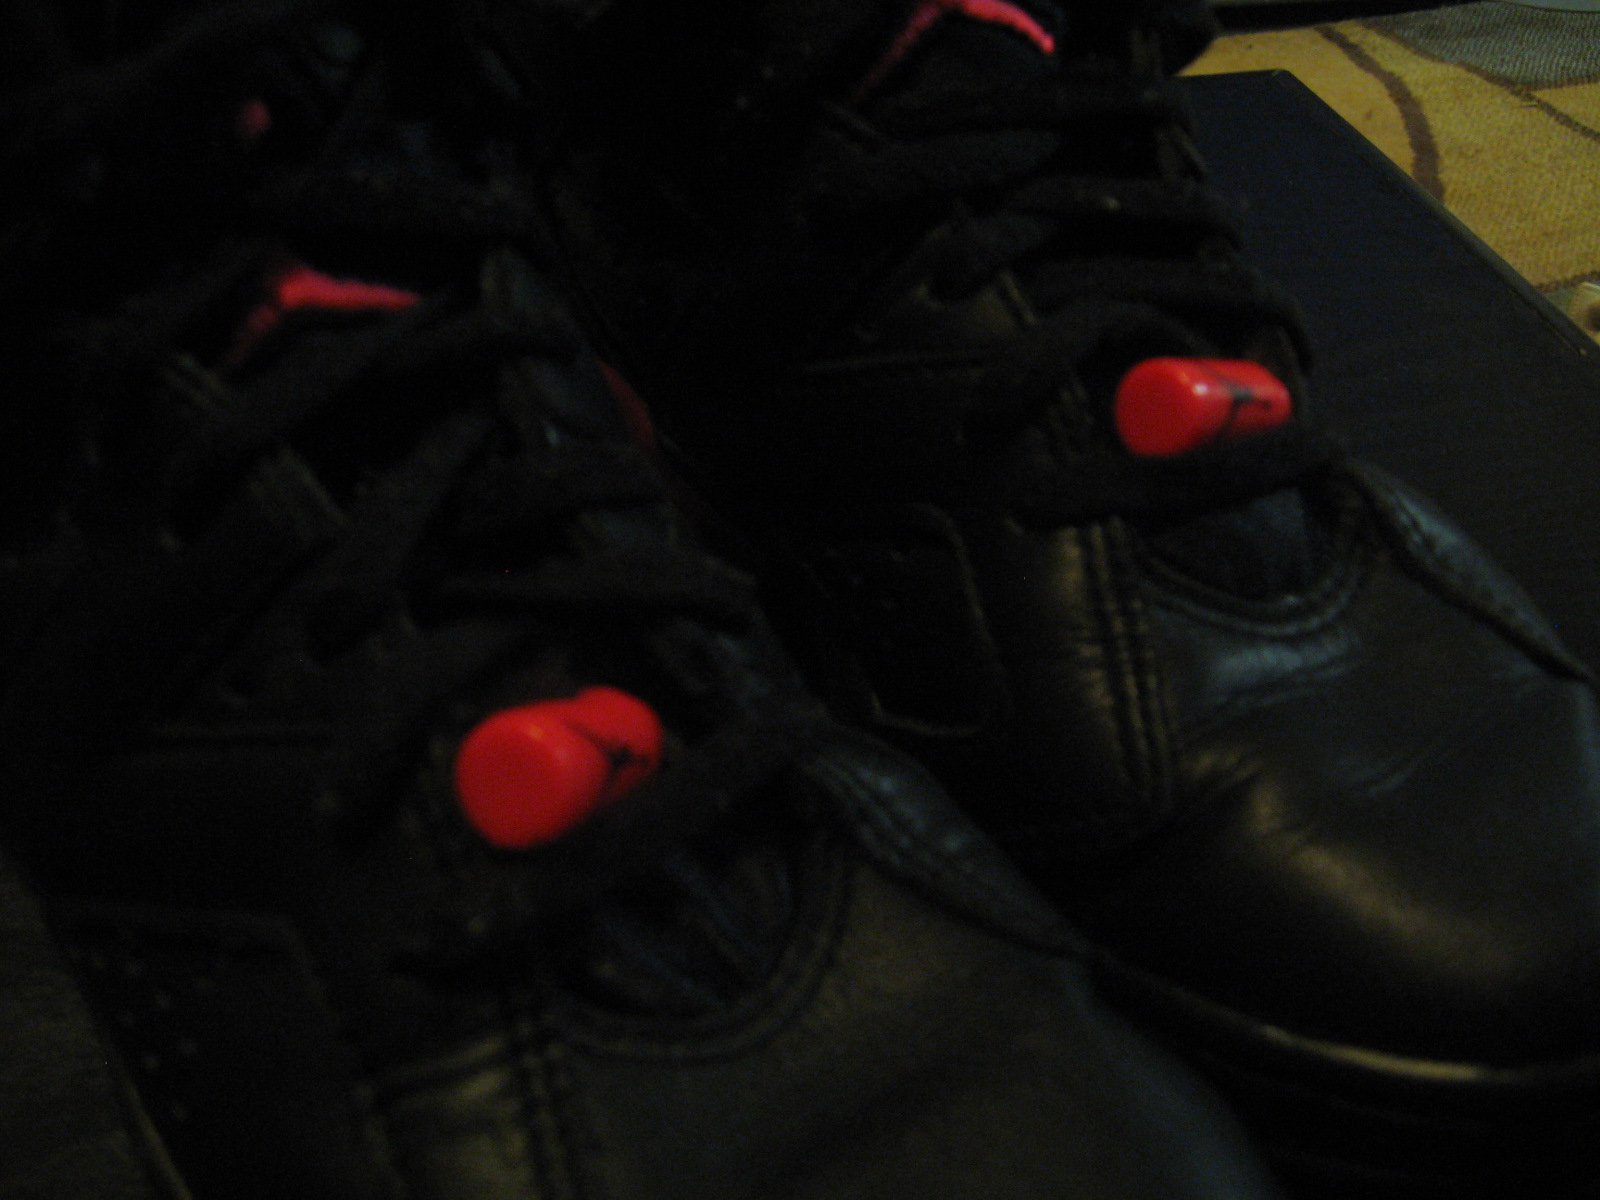 Tags: Air Jordan I, Air Jordan IV, Air Jordan Retro, Air Jordan VI, Air  Jordan X, Air Jordan XX, air jordans, Flightposite, For Sale, nike, ...